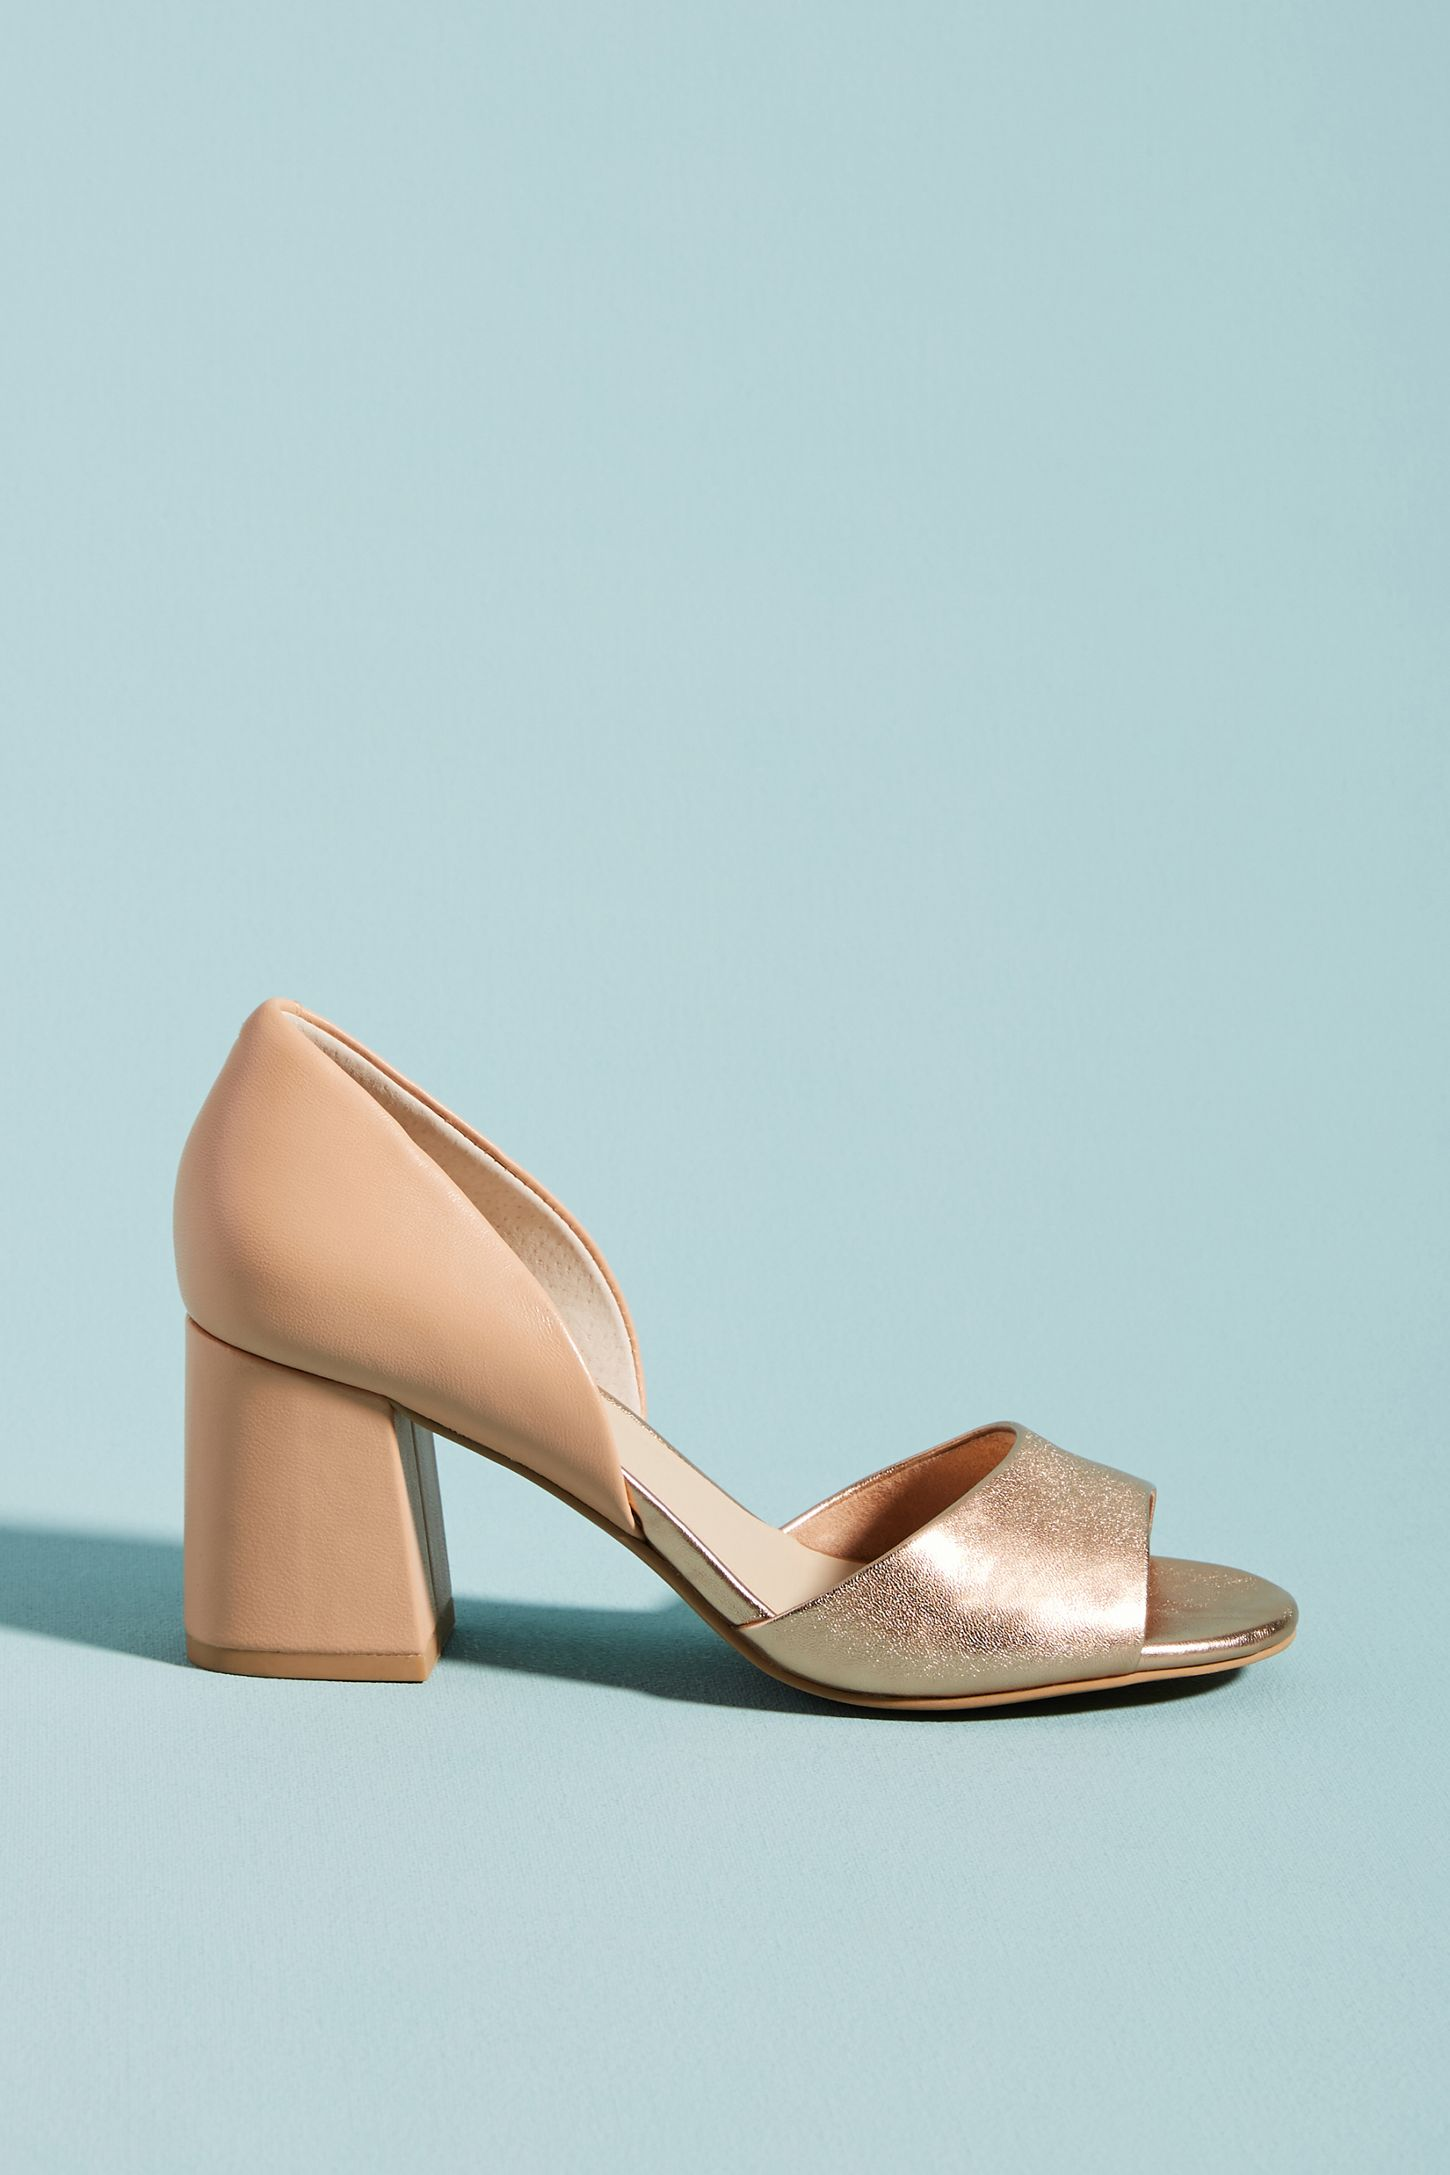 a1147cf2c2 Seychelles Shabby Chic Heels | Anthropologie